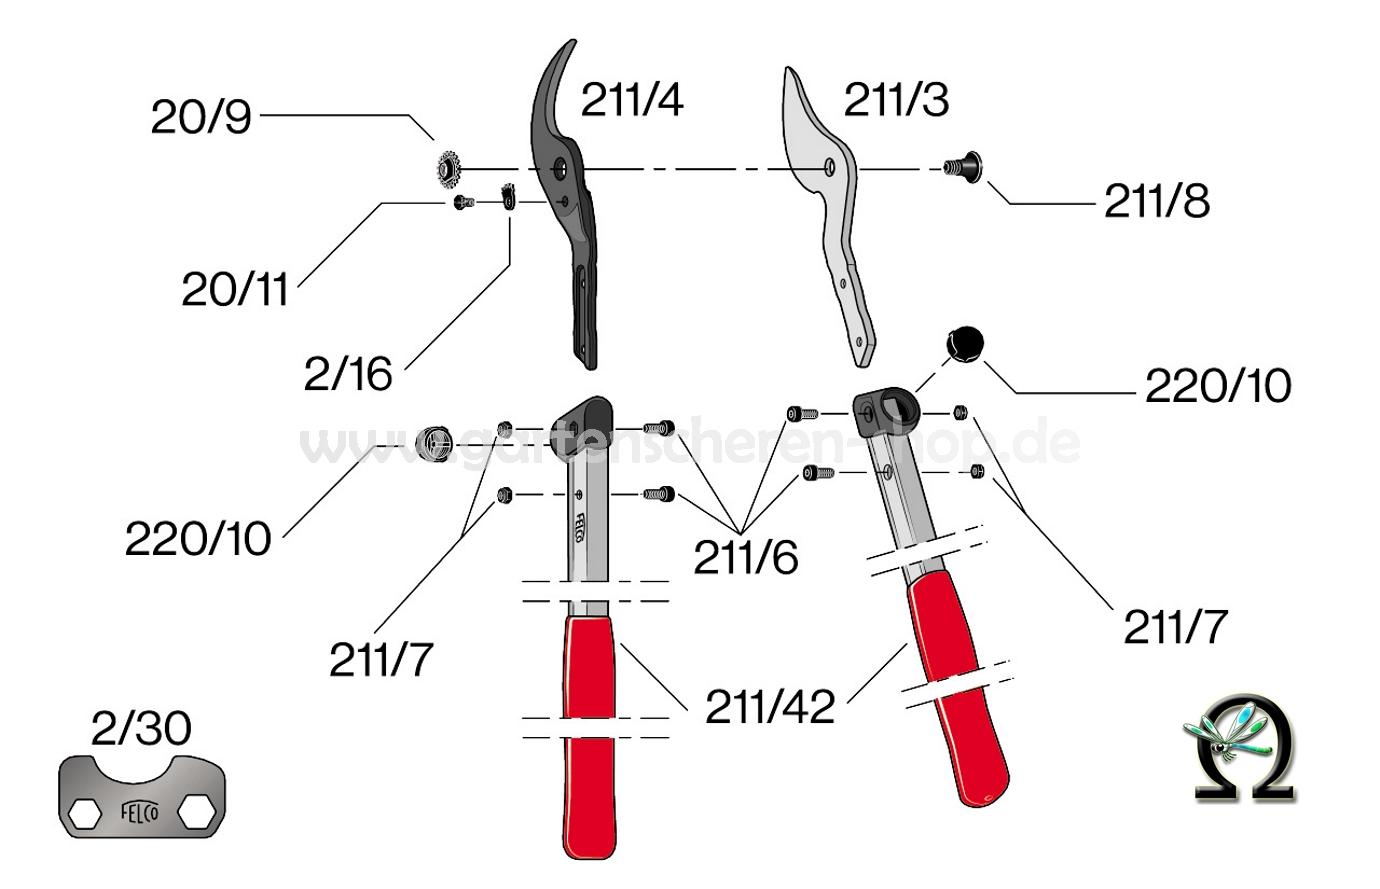 felco-211-60-explosionszeichnung